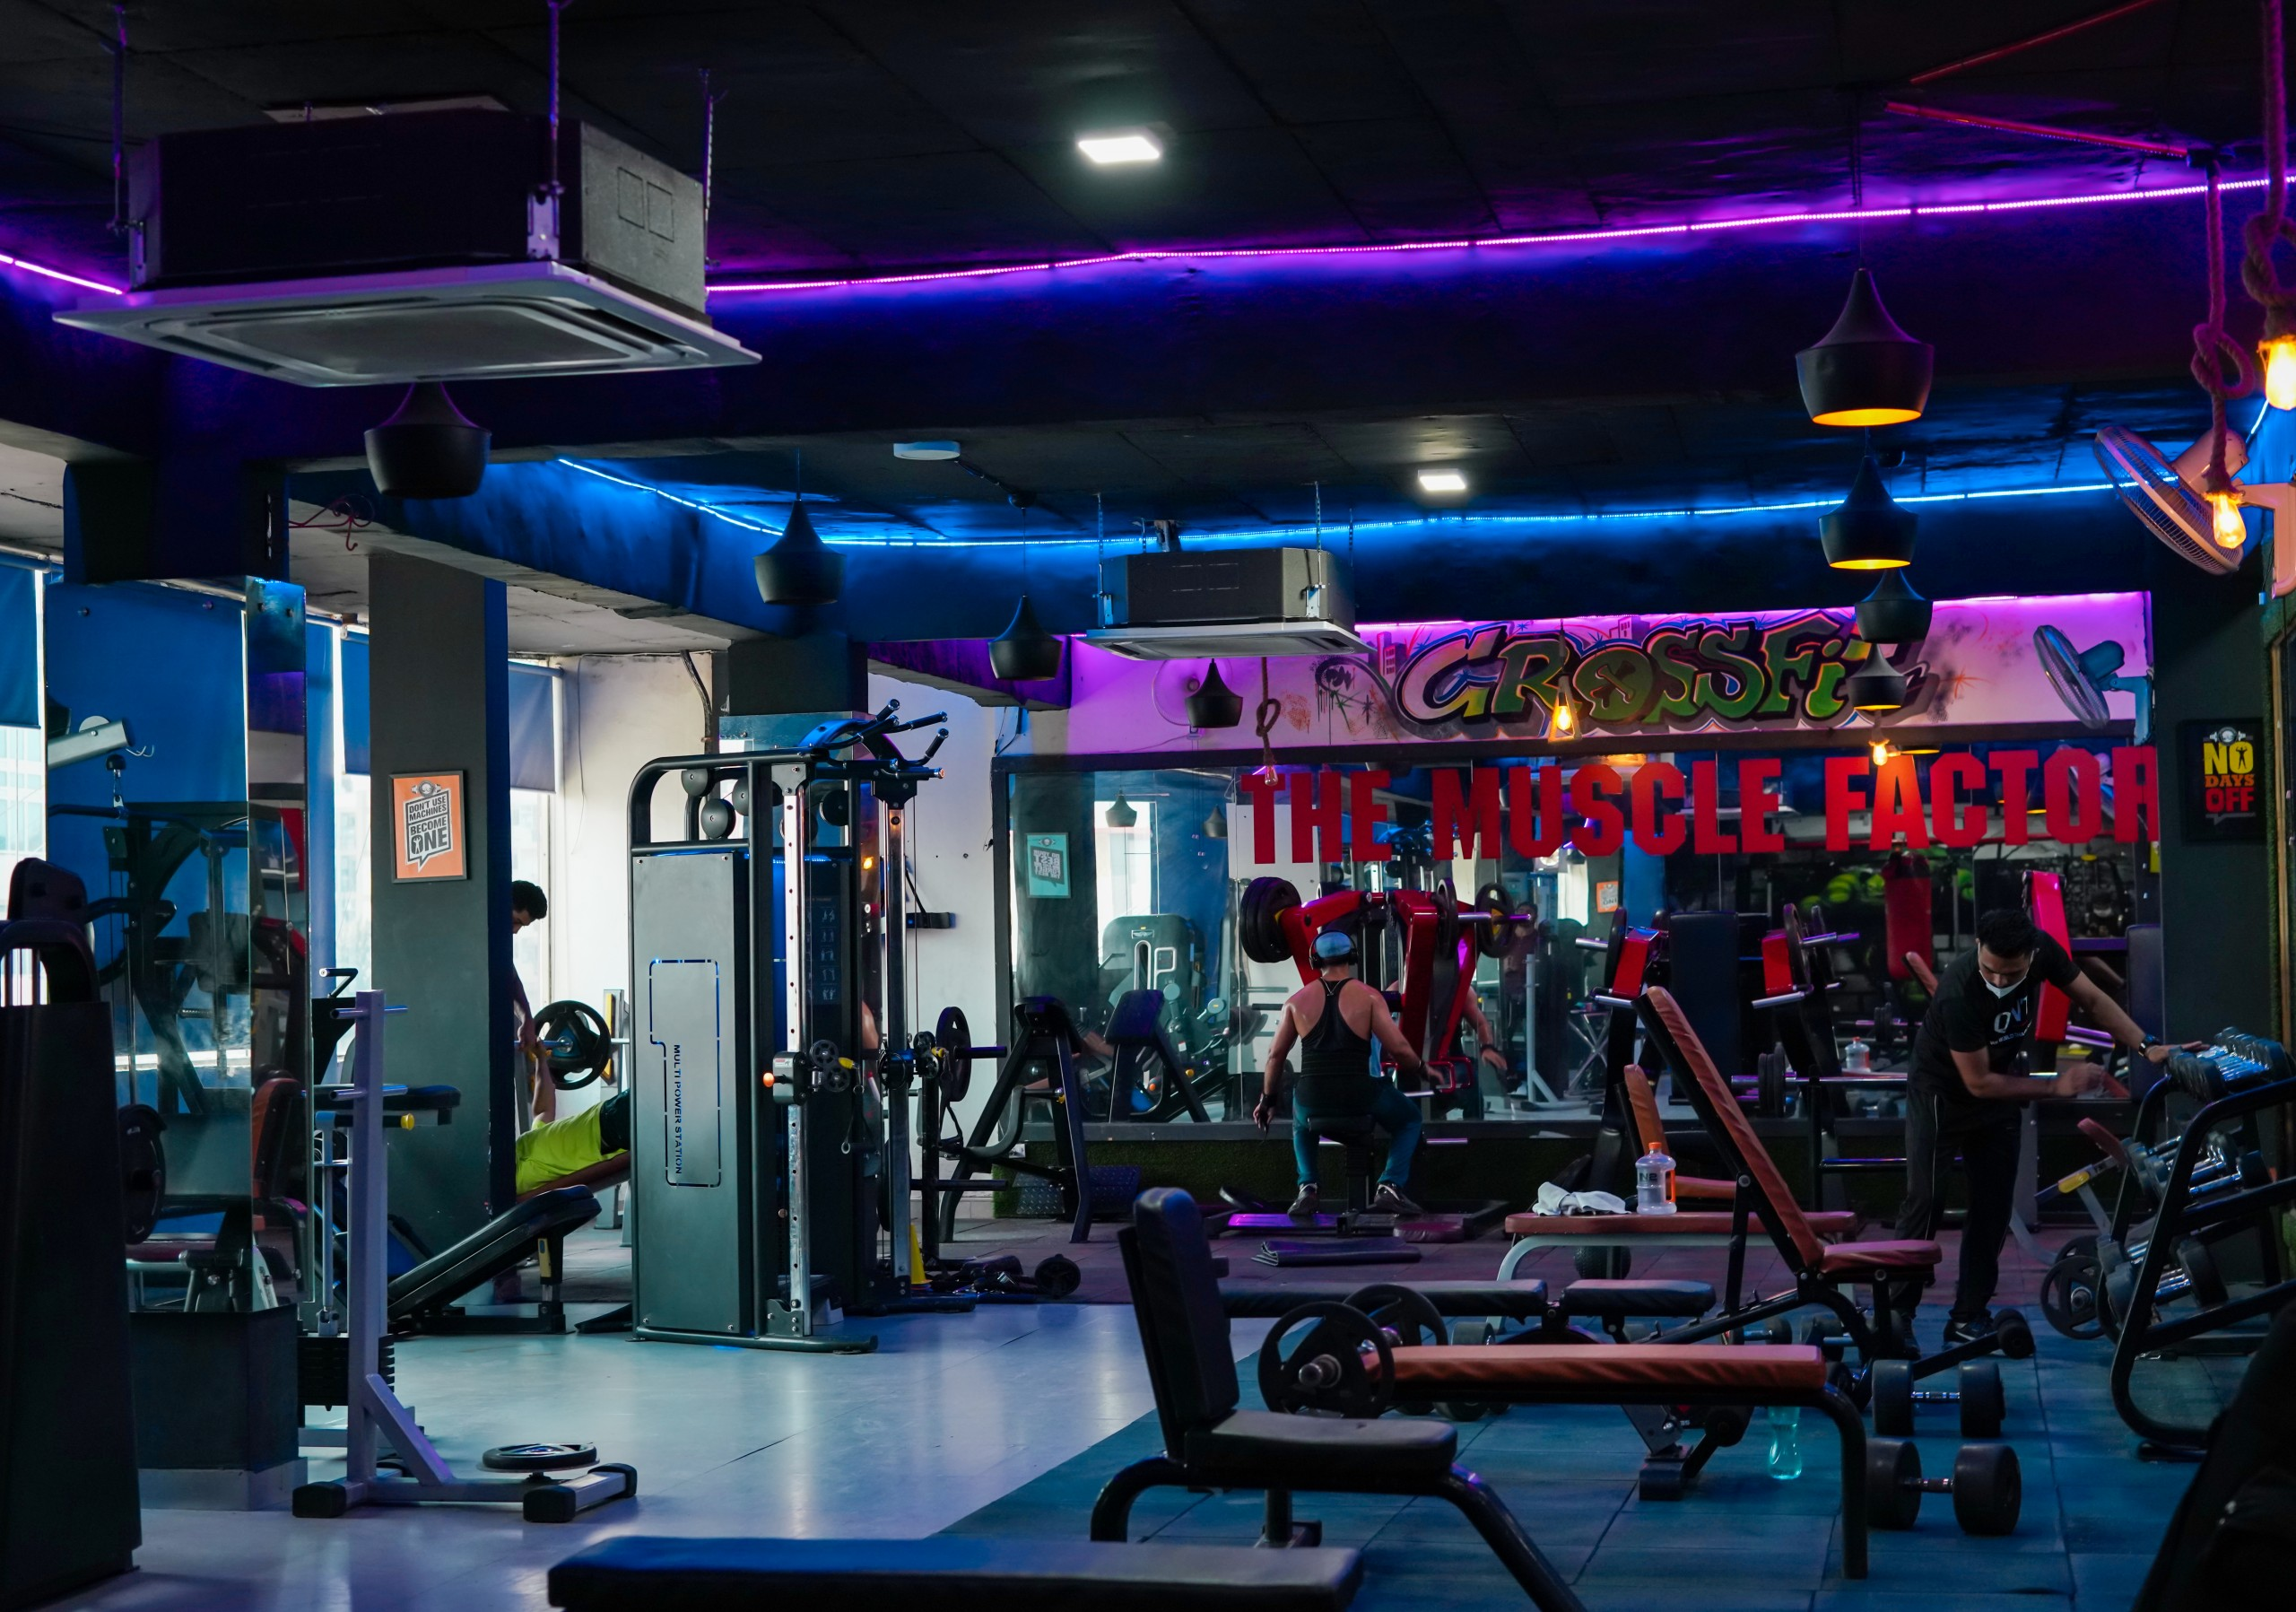 Gym interior and Equipment